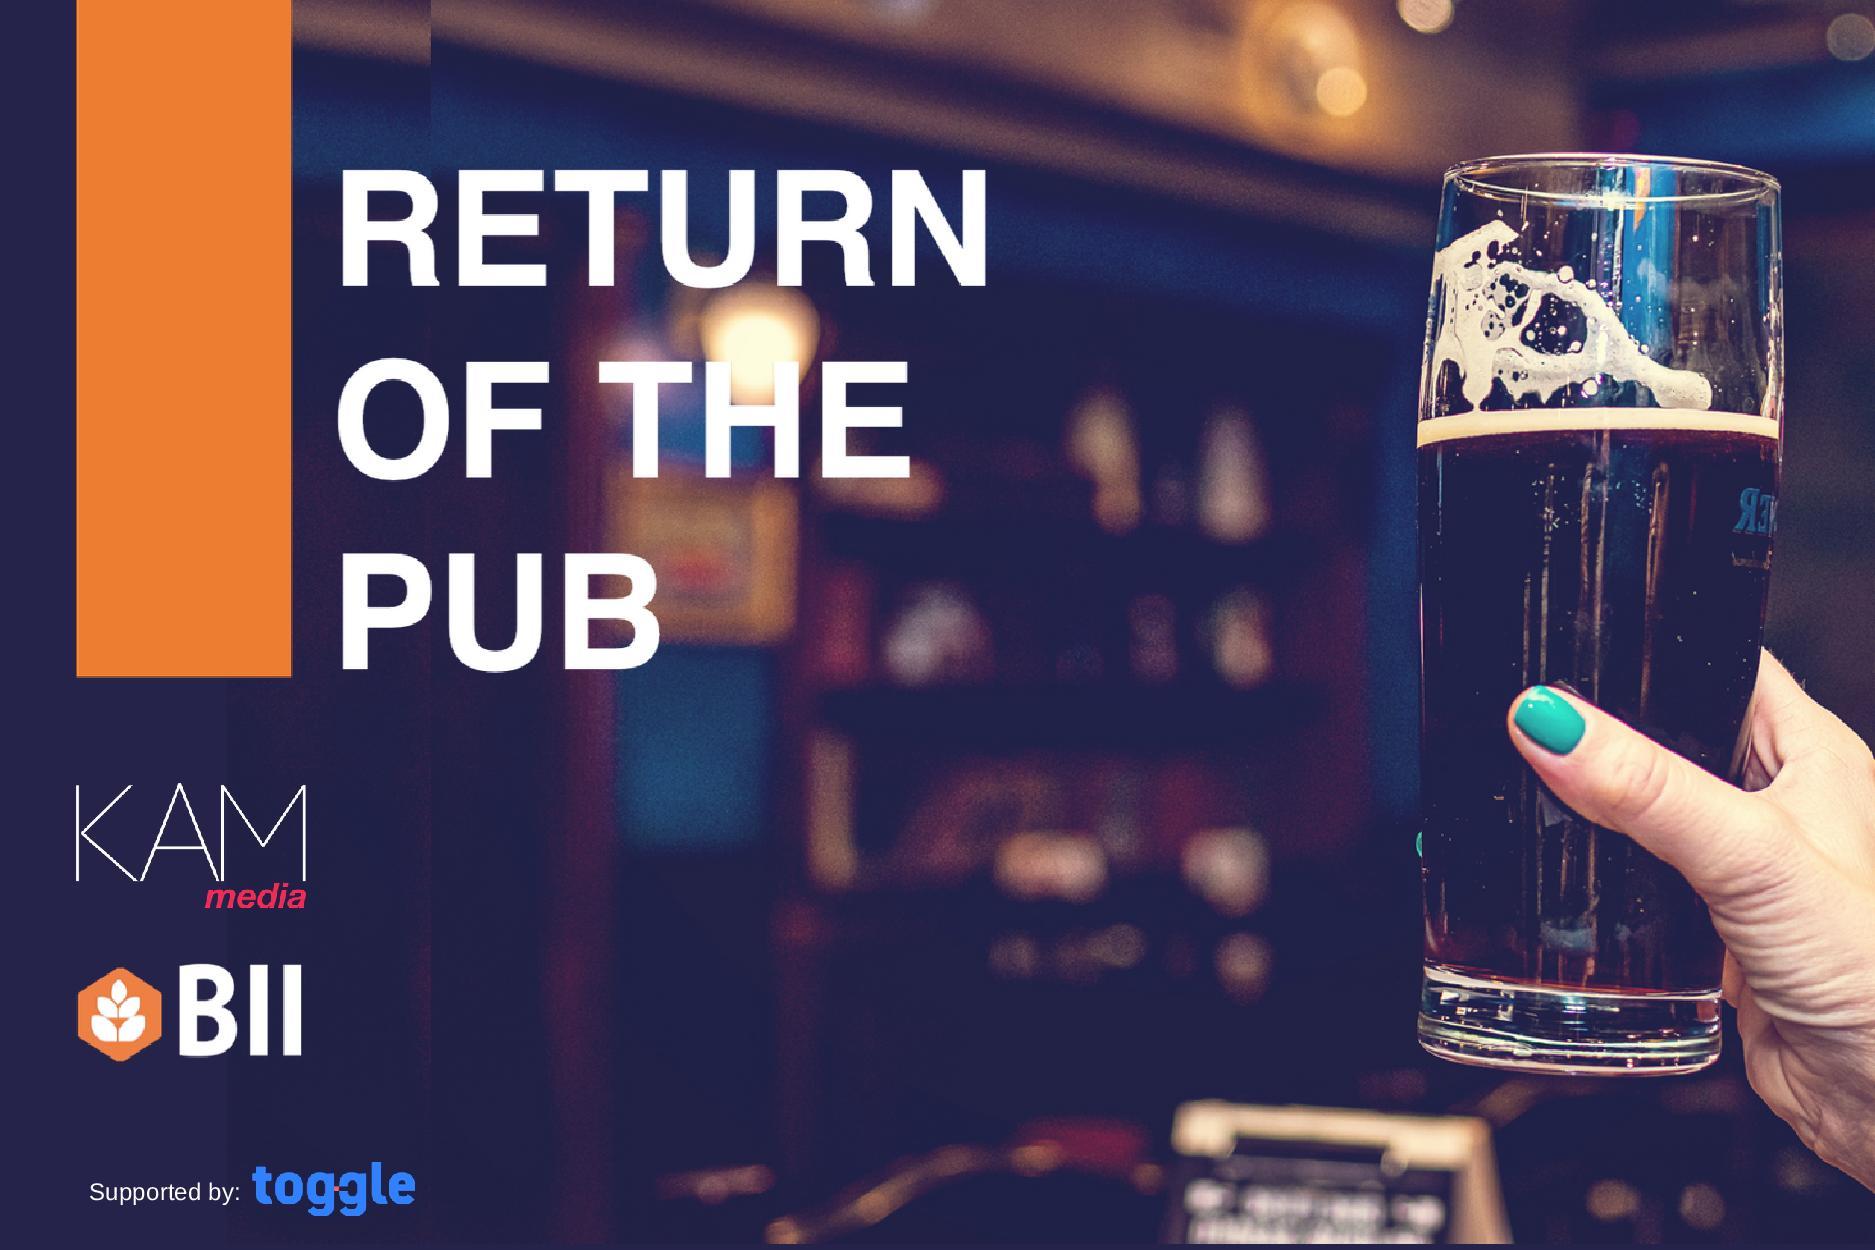 Return of the pub